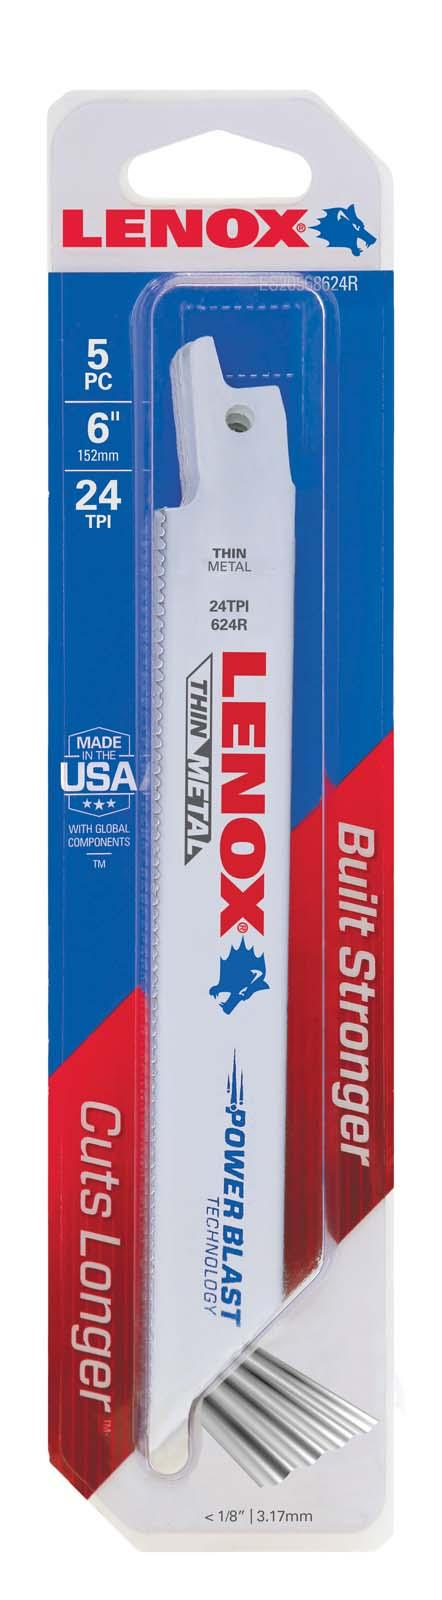 Amazon.com: Lenox 20554 – 424R – 4